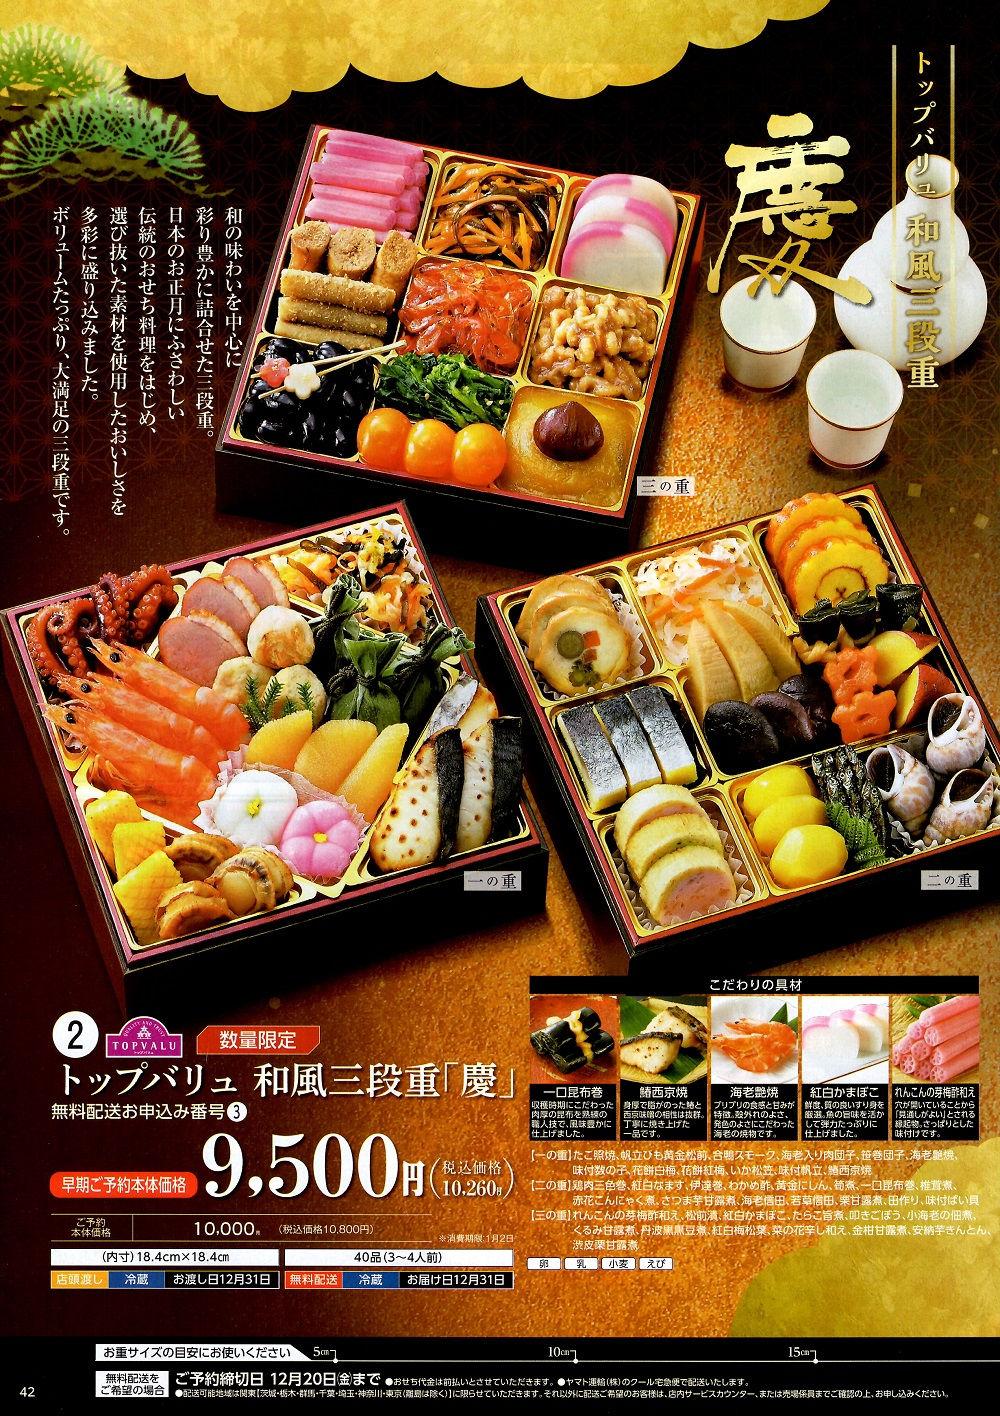 KASUMI(カスミ)三里塚店の『おせち』パンフレット(メイン商品2)